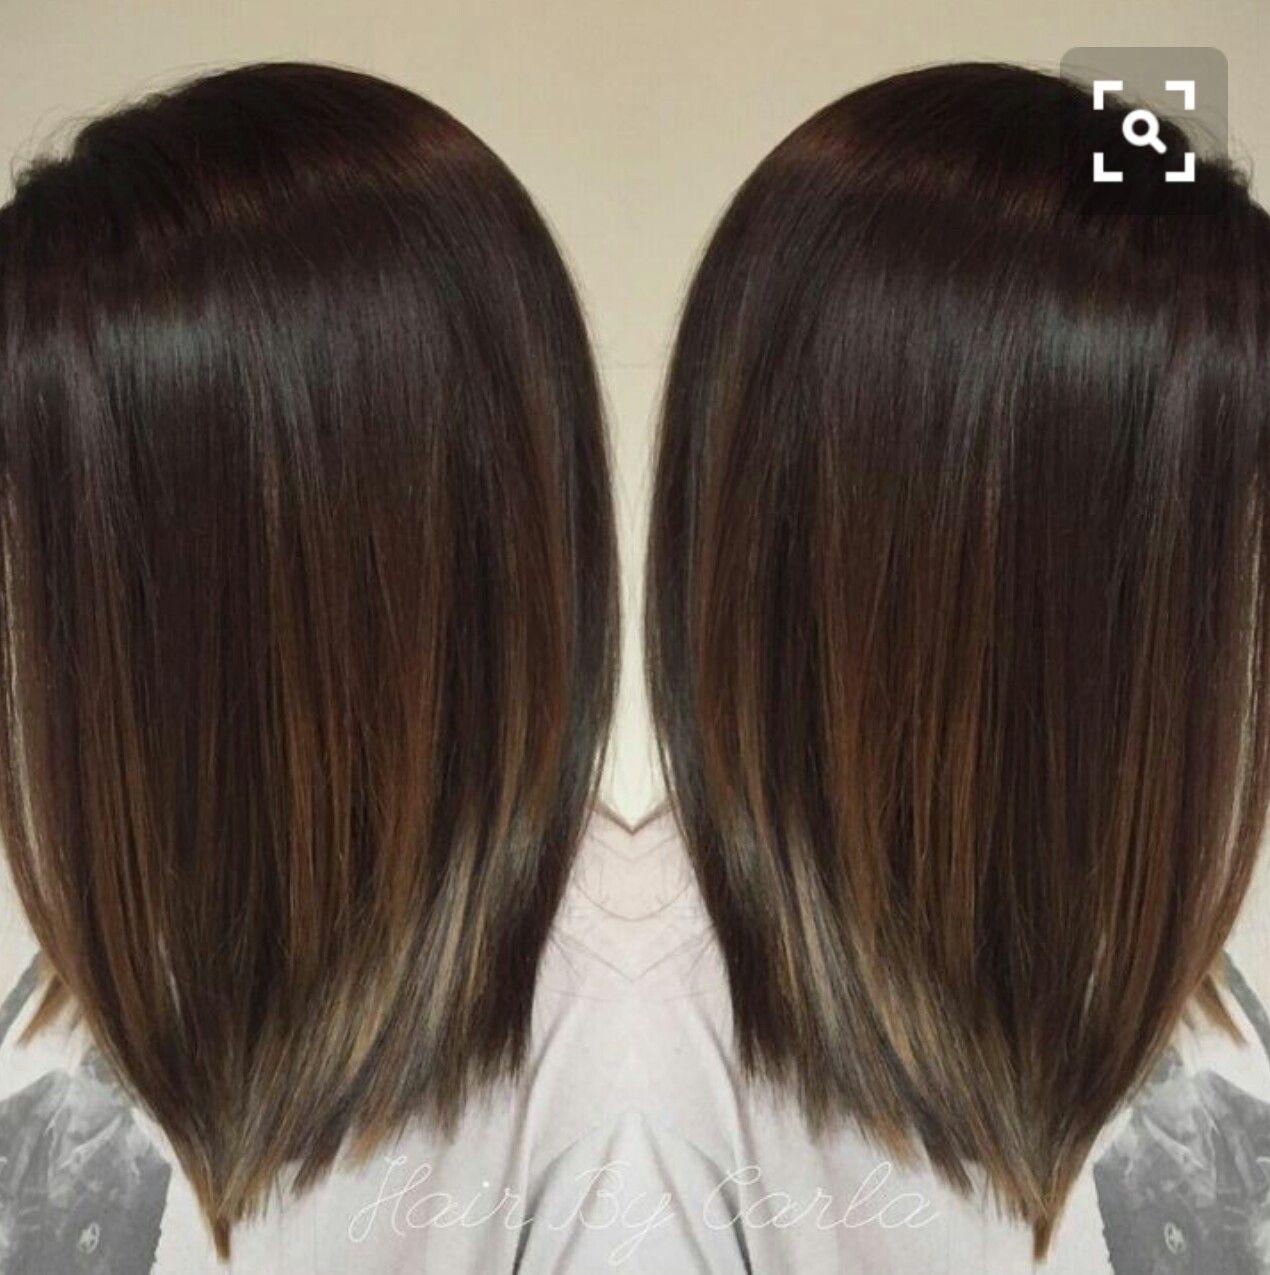 Pin by liliana on Балаяж pinterest hair hair styles and balayage